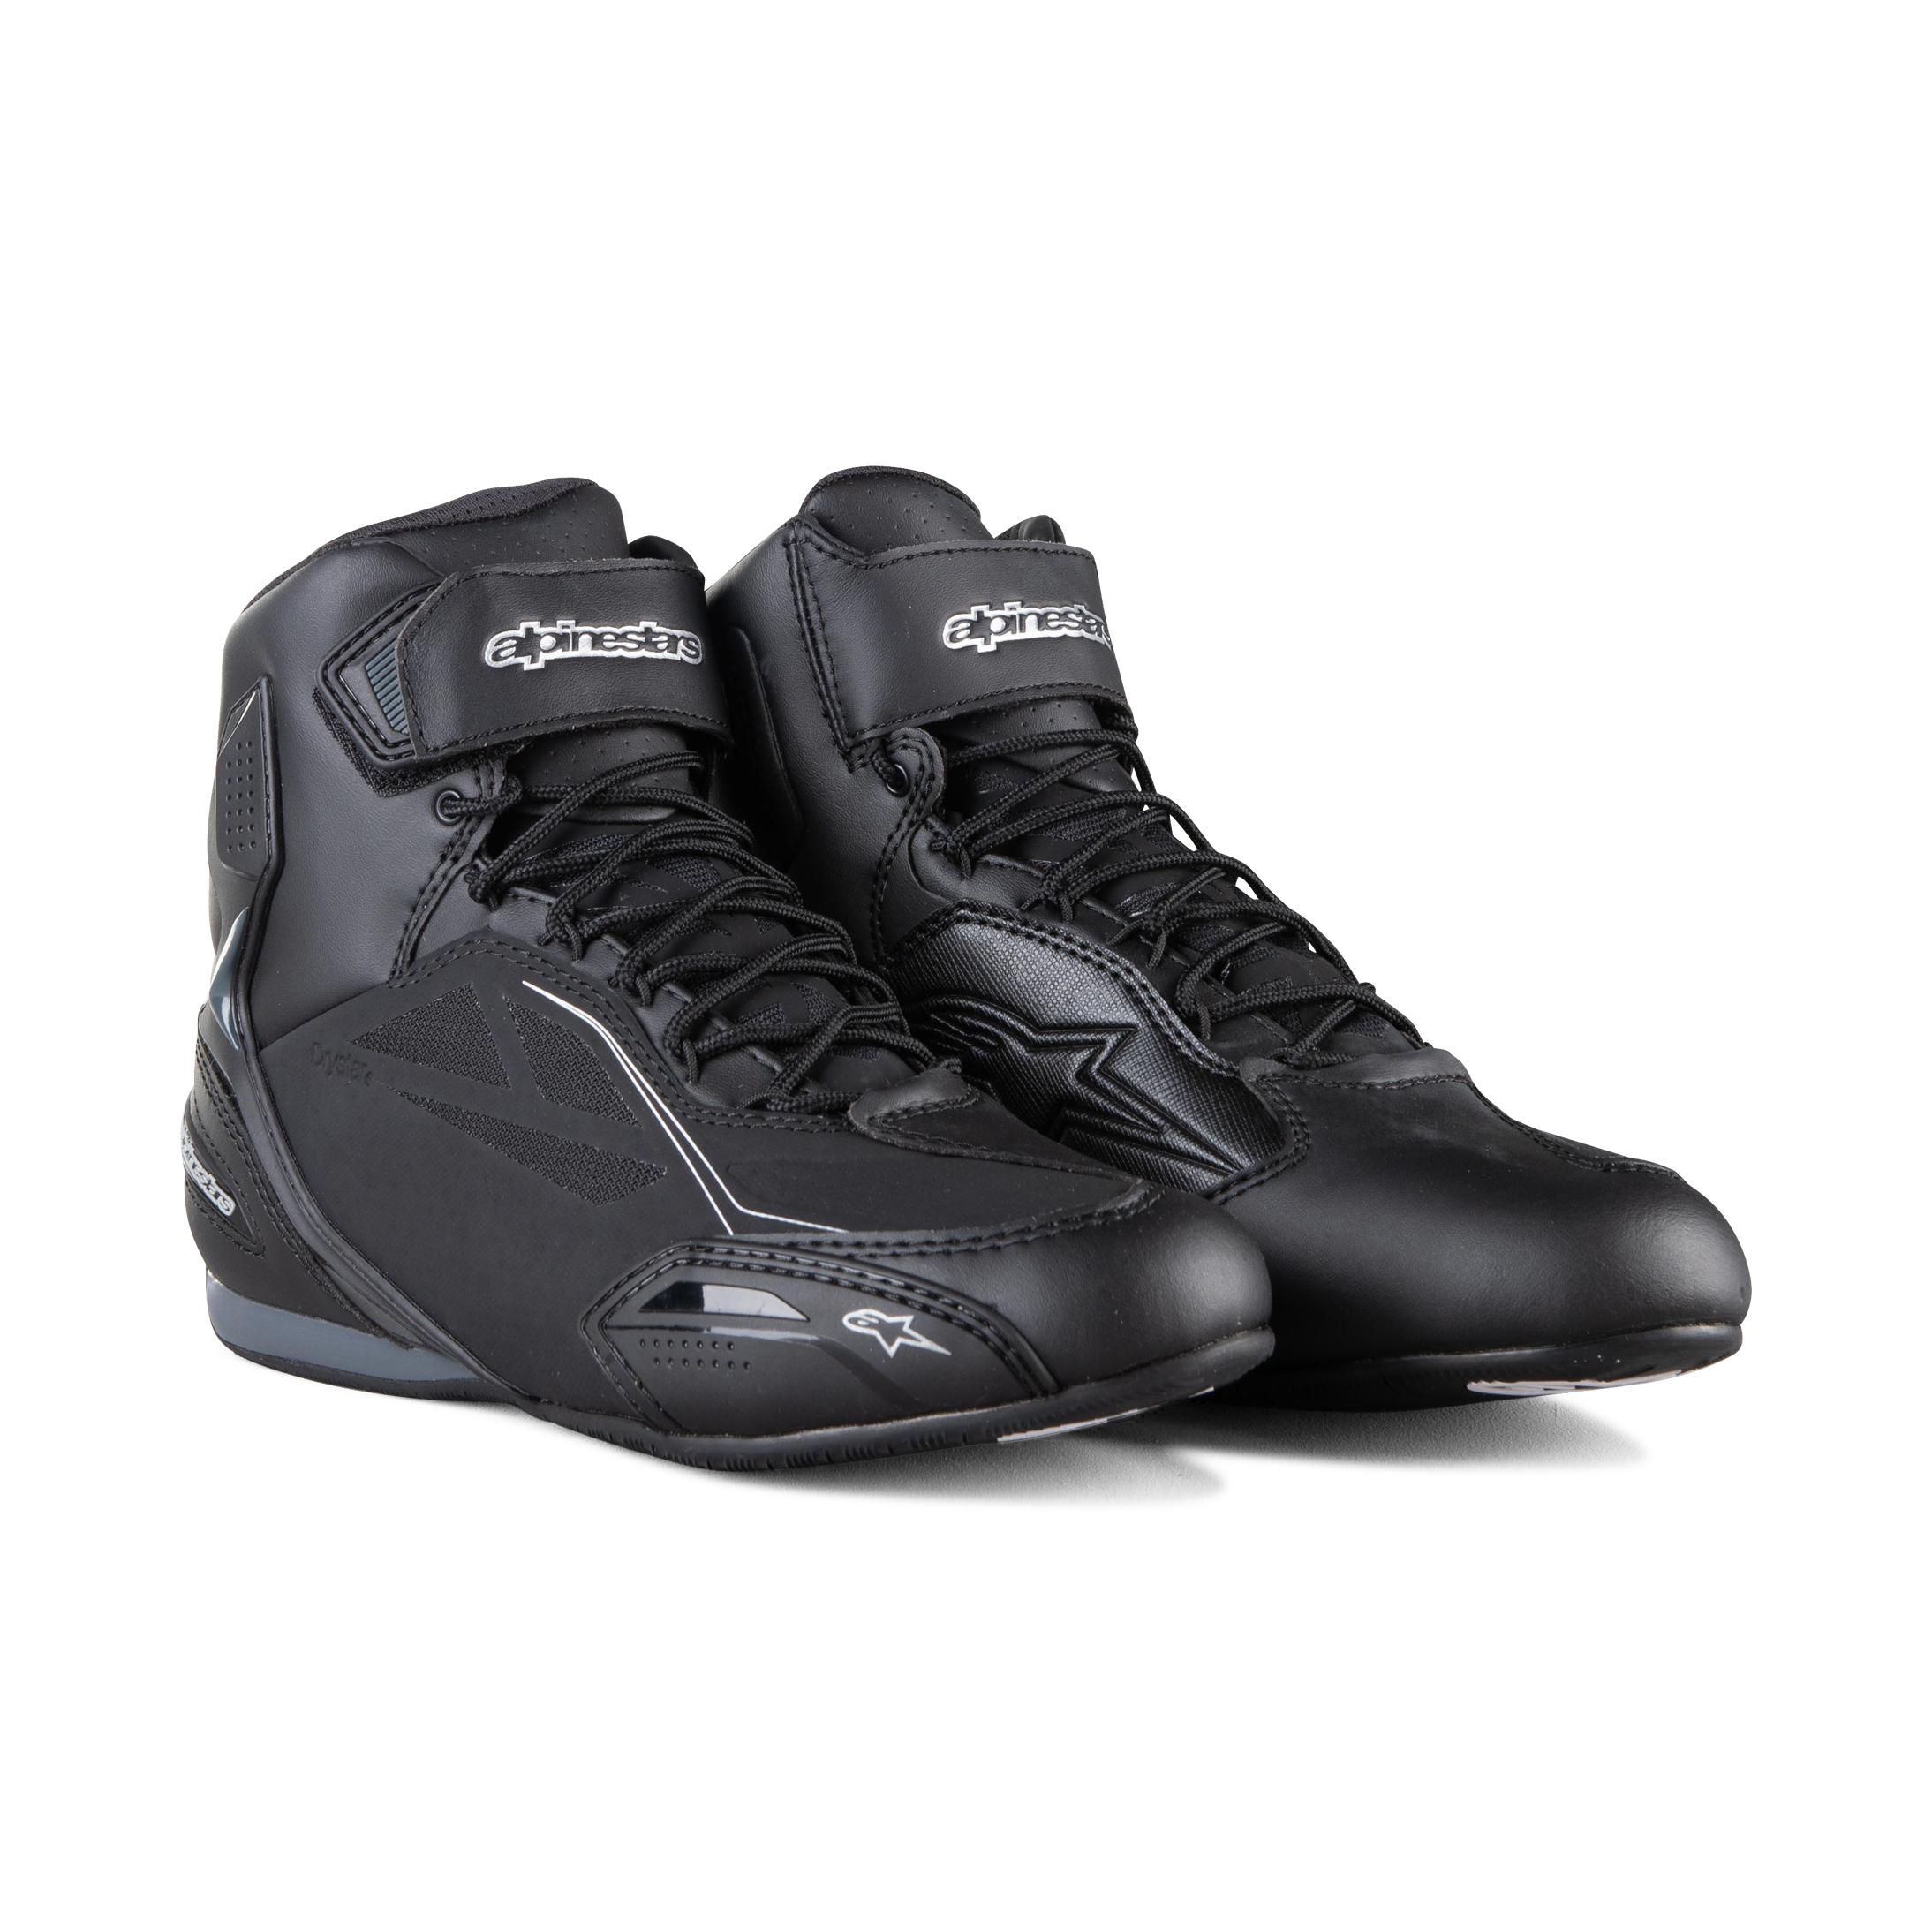 Alpinestars Chaussures Moto Alpinestars Stella Faster-3 Drystar® Noir-Argent 43,5